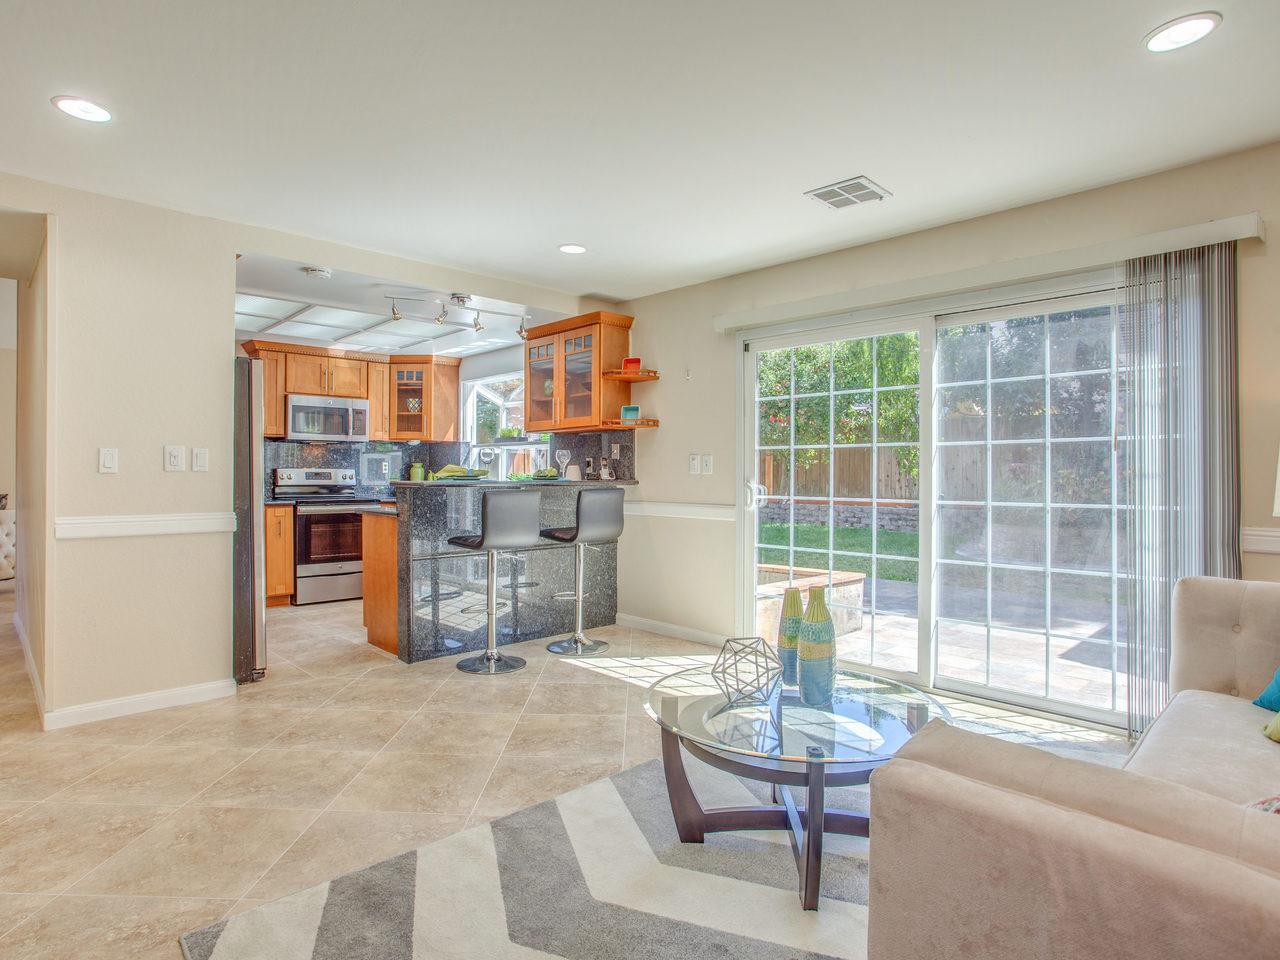 4620 Kelso St Union City CA-MLS_Size-013-1-Family Room-1280x960-72dpi.jpg